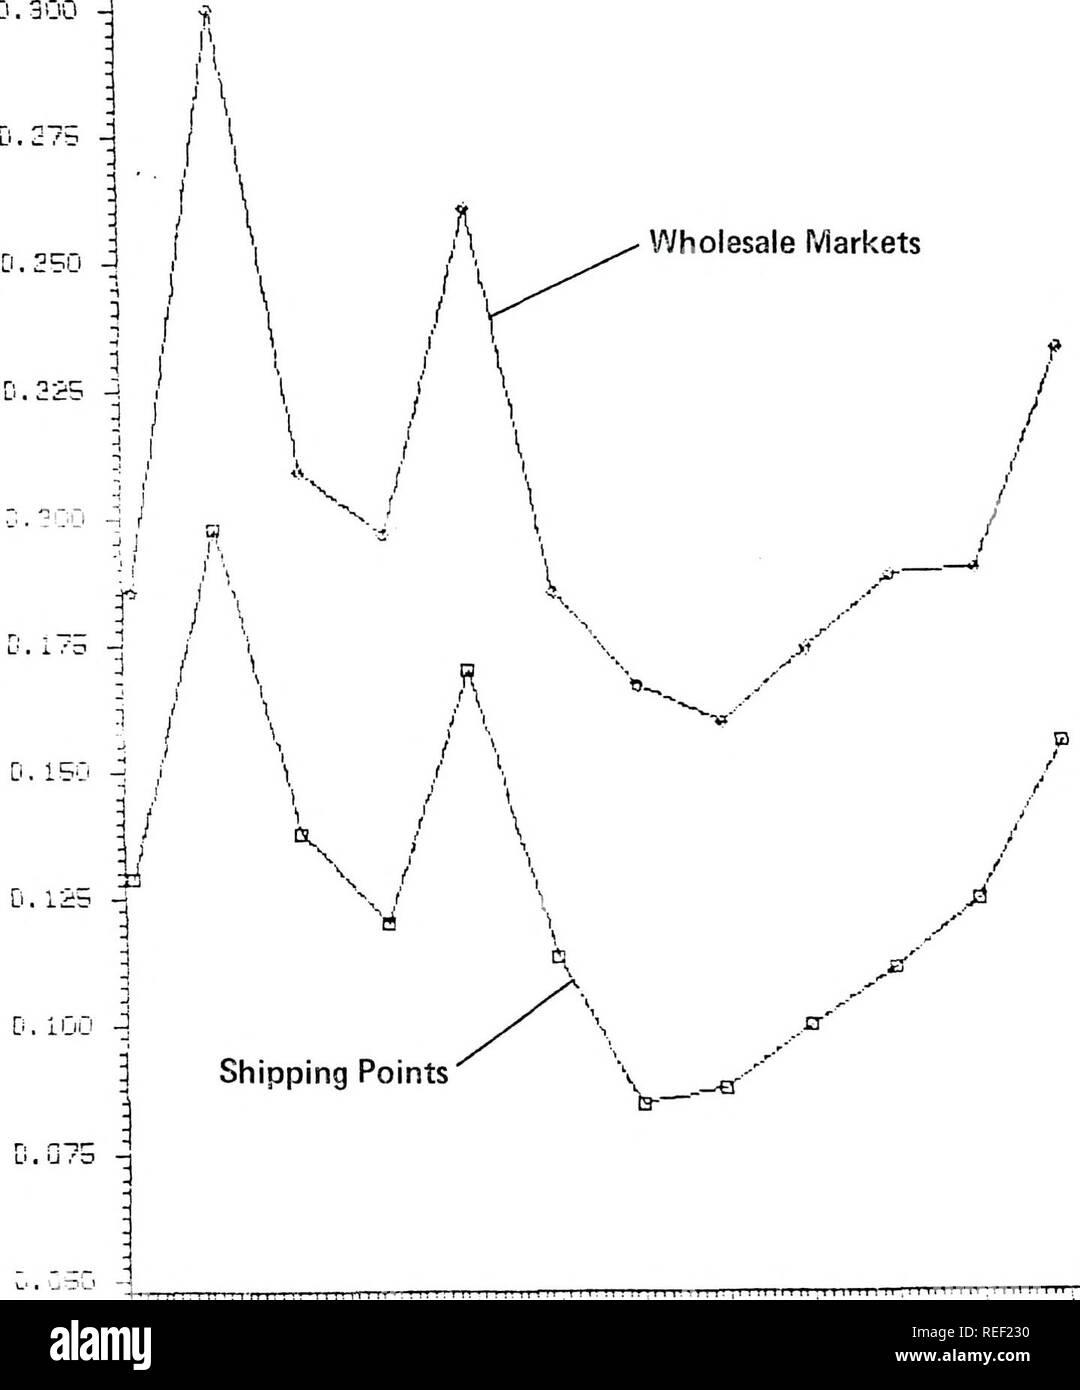 Grade Point Average Stock Photos & Grade Point Average Stock